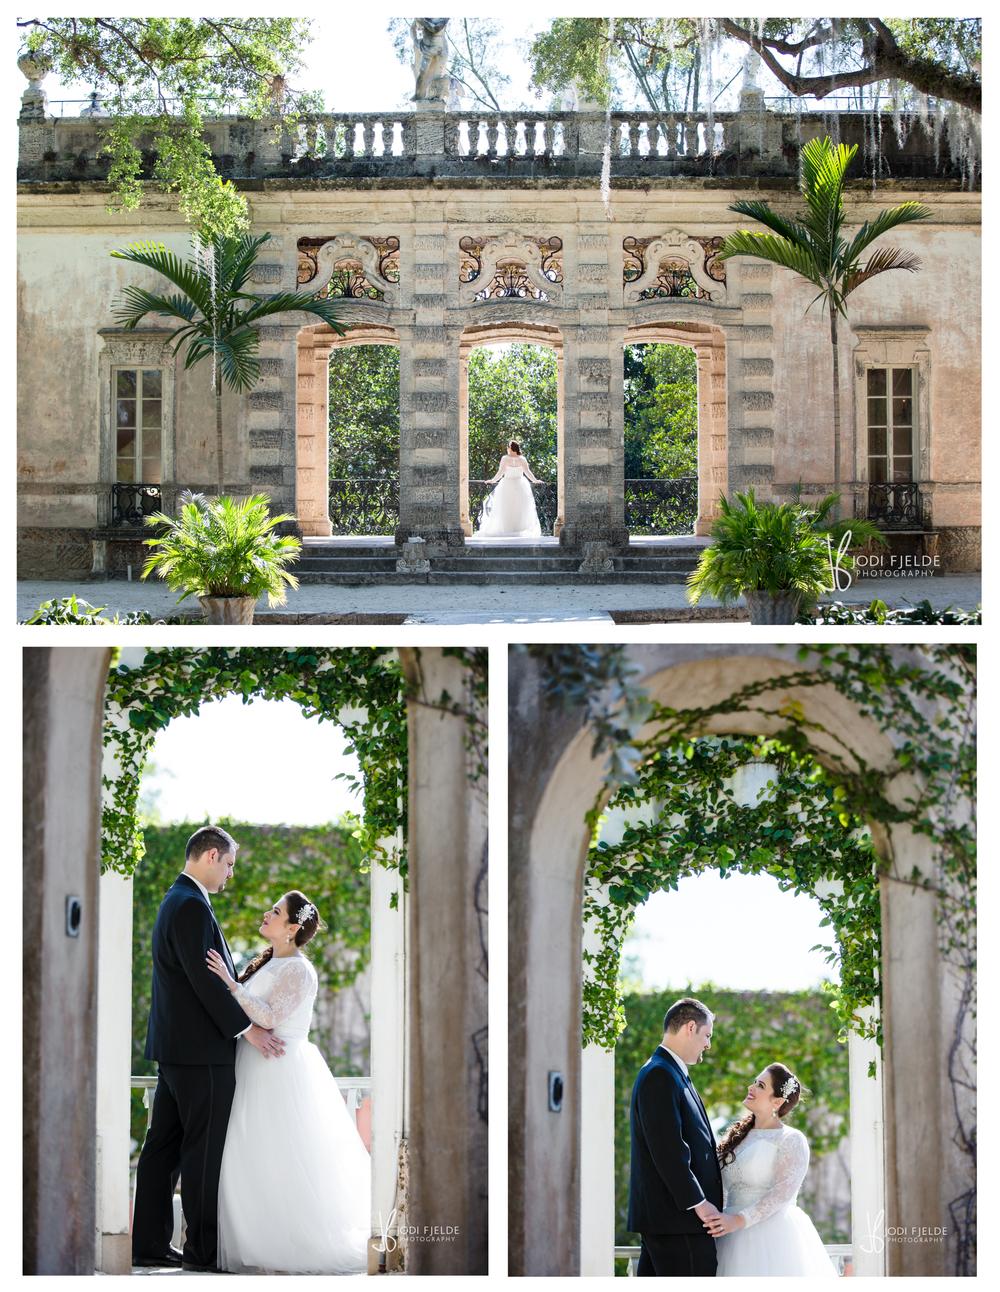 Vizcaya_Miami_Florida_Bridal_Wedding_Portraits_Jodi_Fjelde_Photography-7.jpg